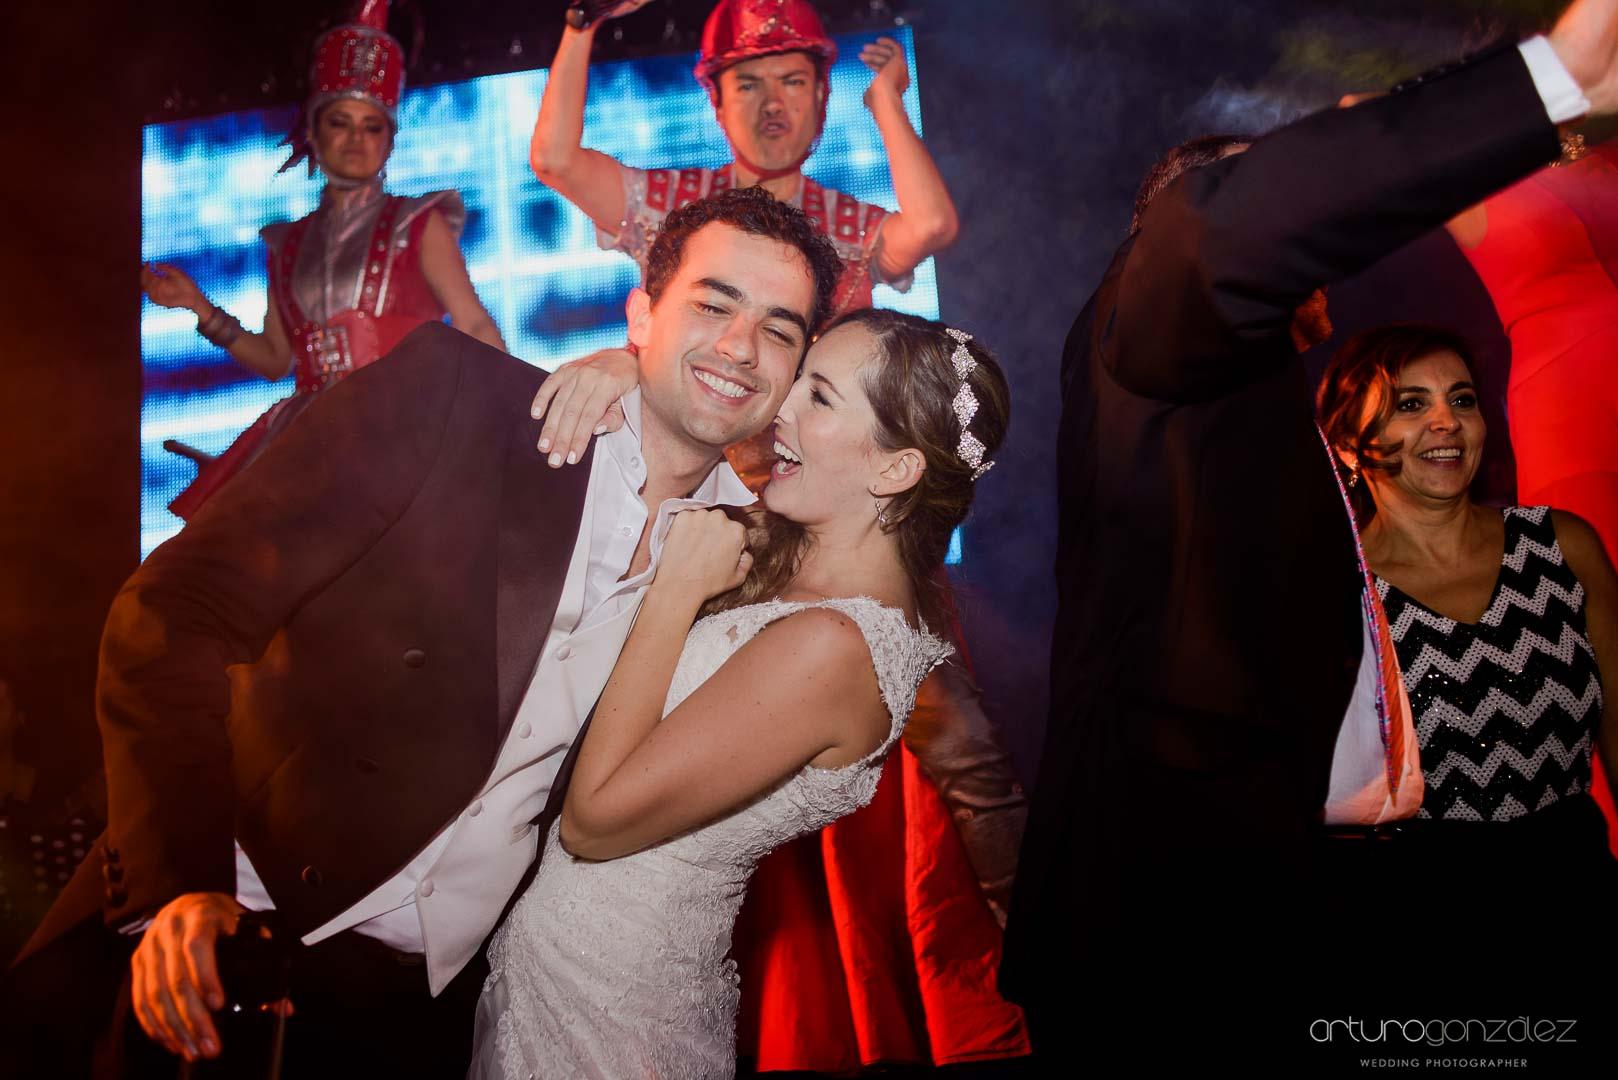 fotografo-de-bodas-en-guanajuato-139